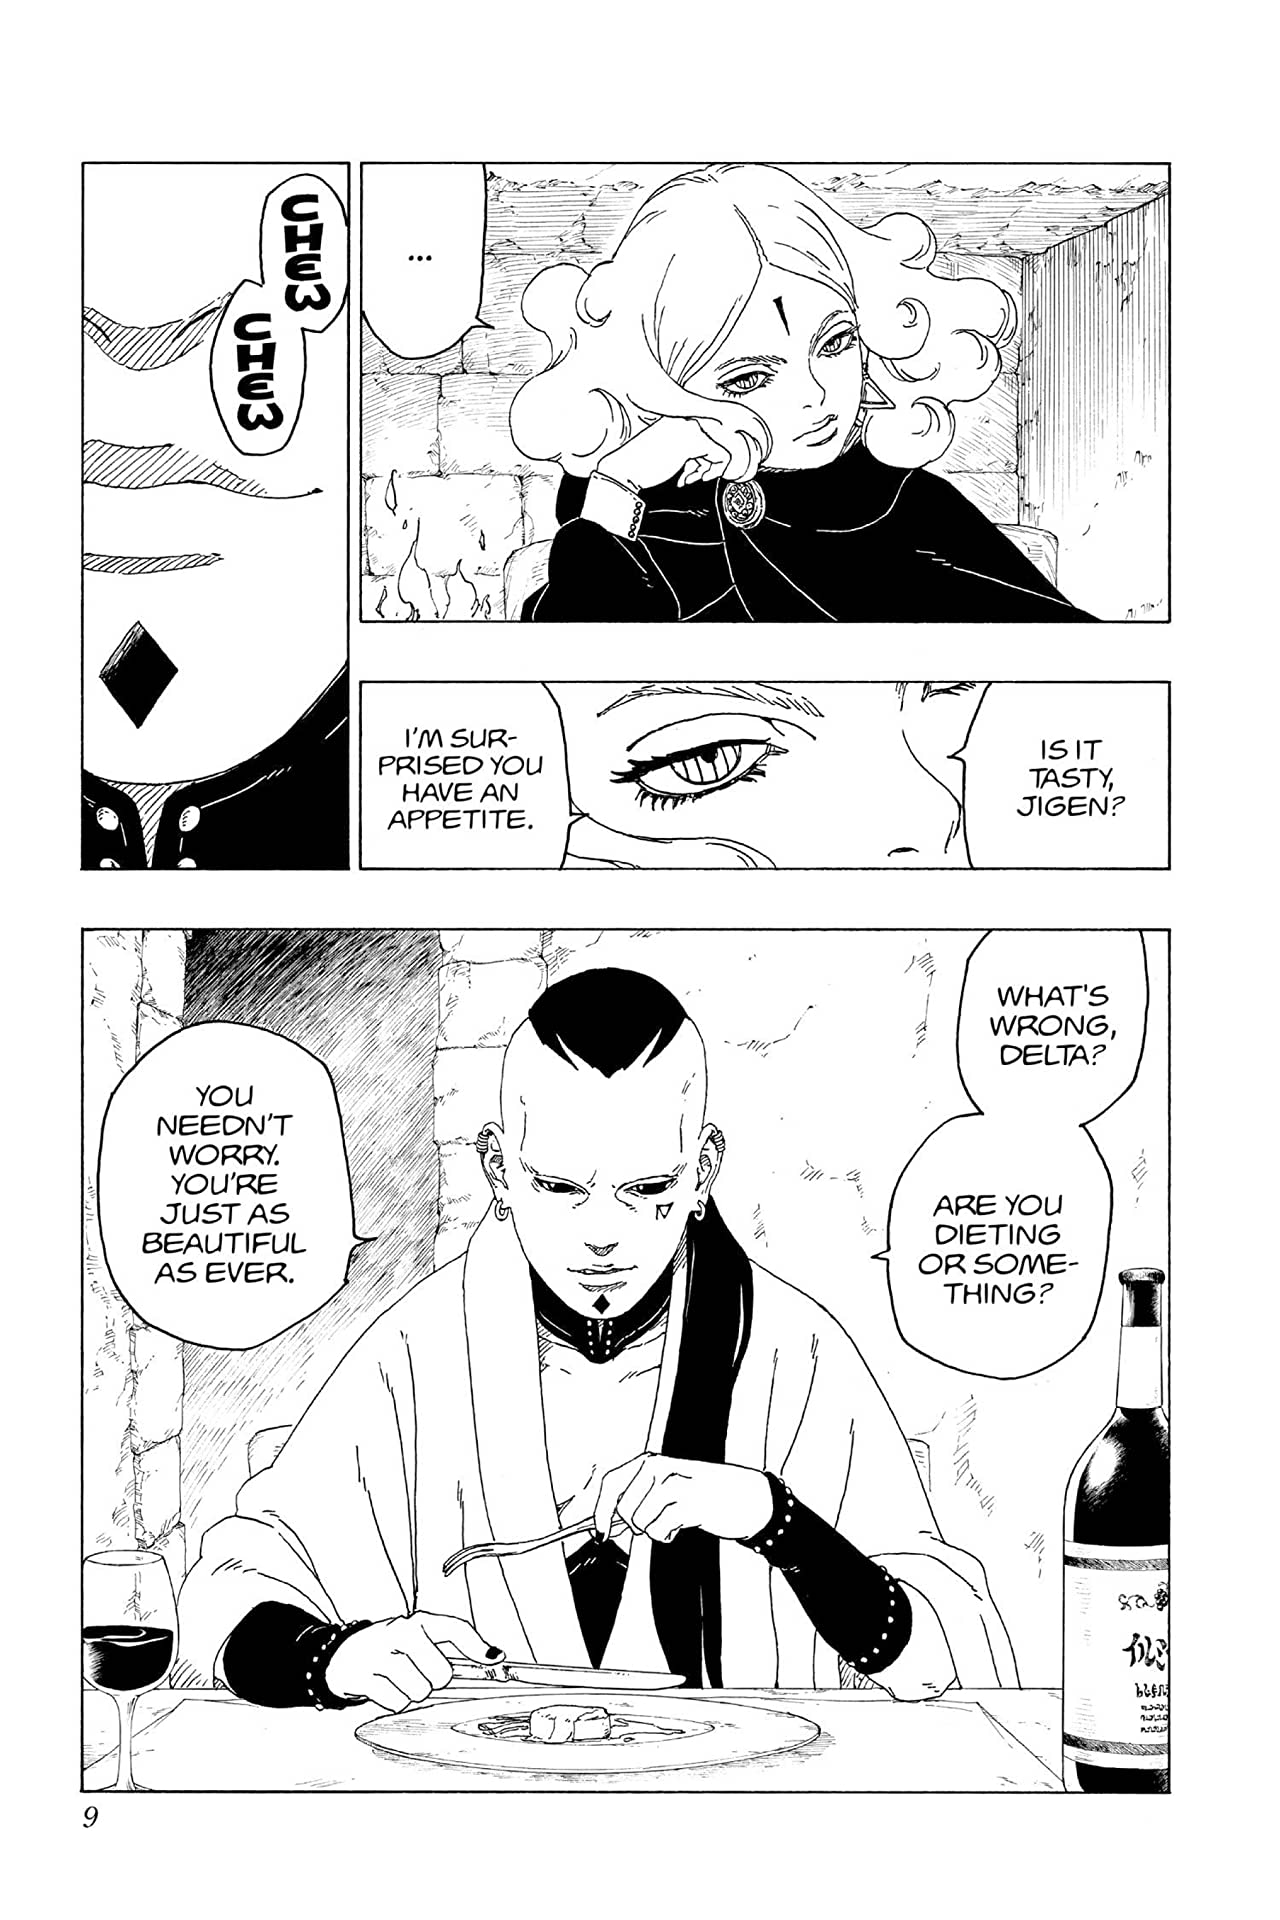 Boruto: Naruto Next Generations Vol. 7: Kawaki